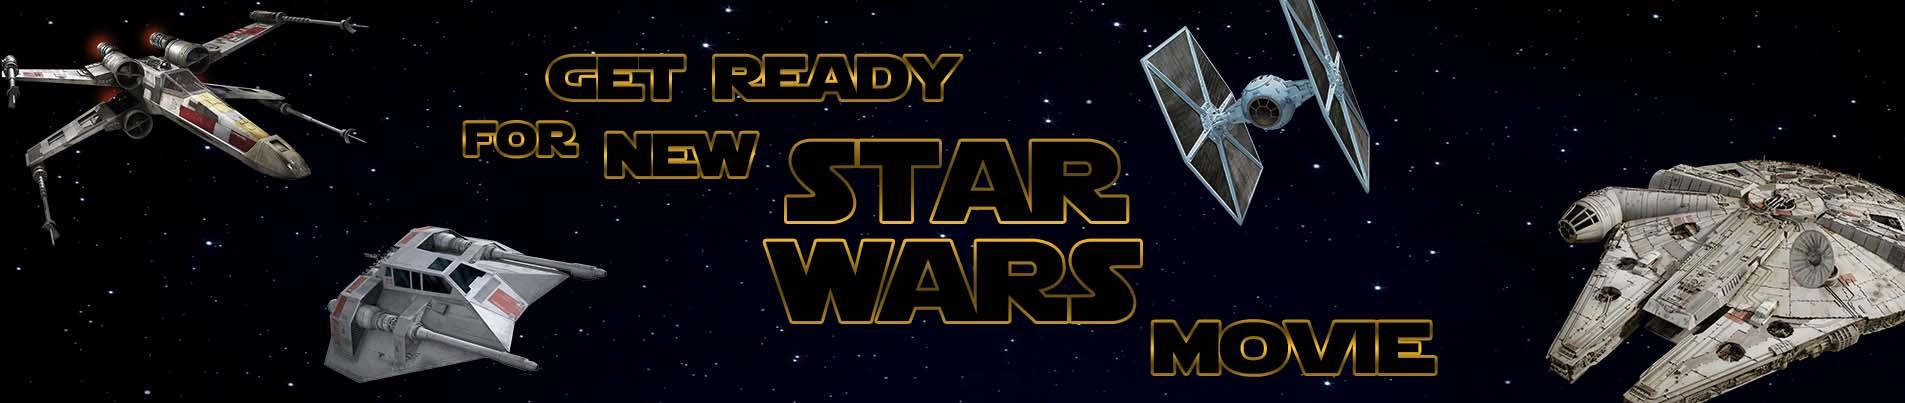 Star Wars Merchandise Wholesale